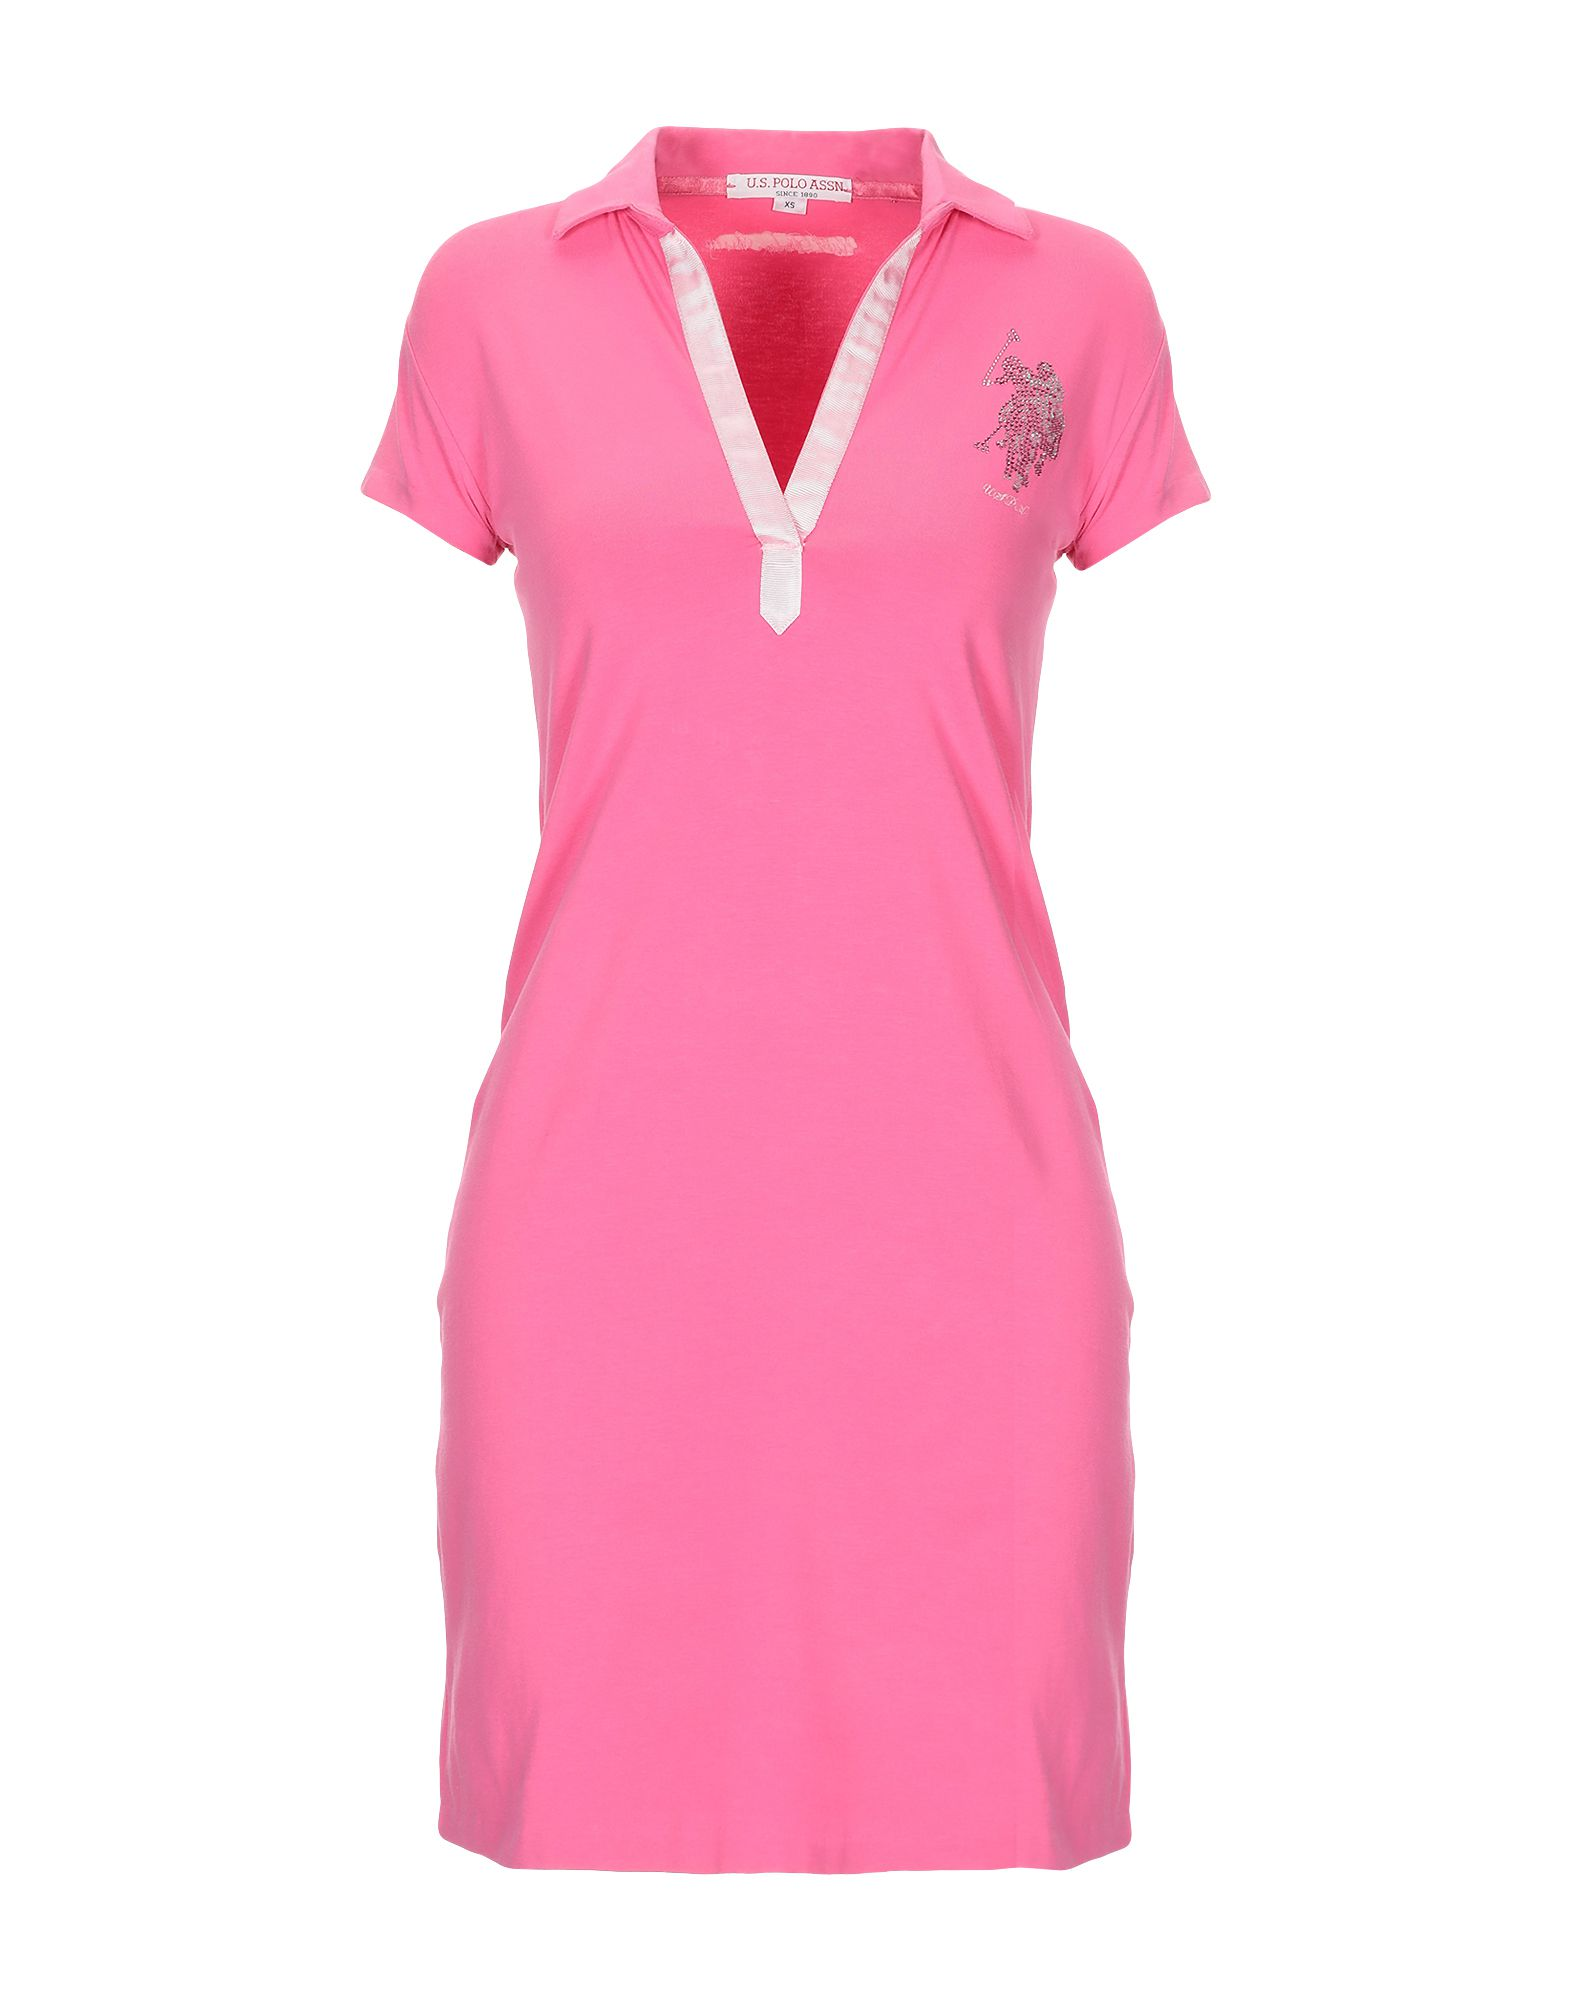 U.S.POLO ASSN. Damen Kurzes Kleid Farbe Fuchsia Größe 3